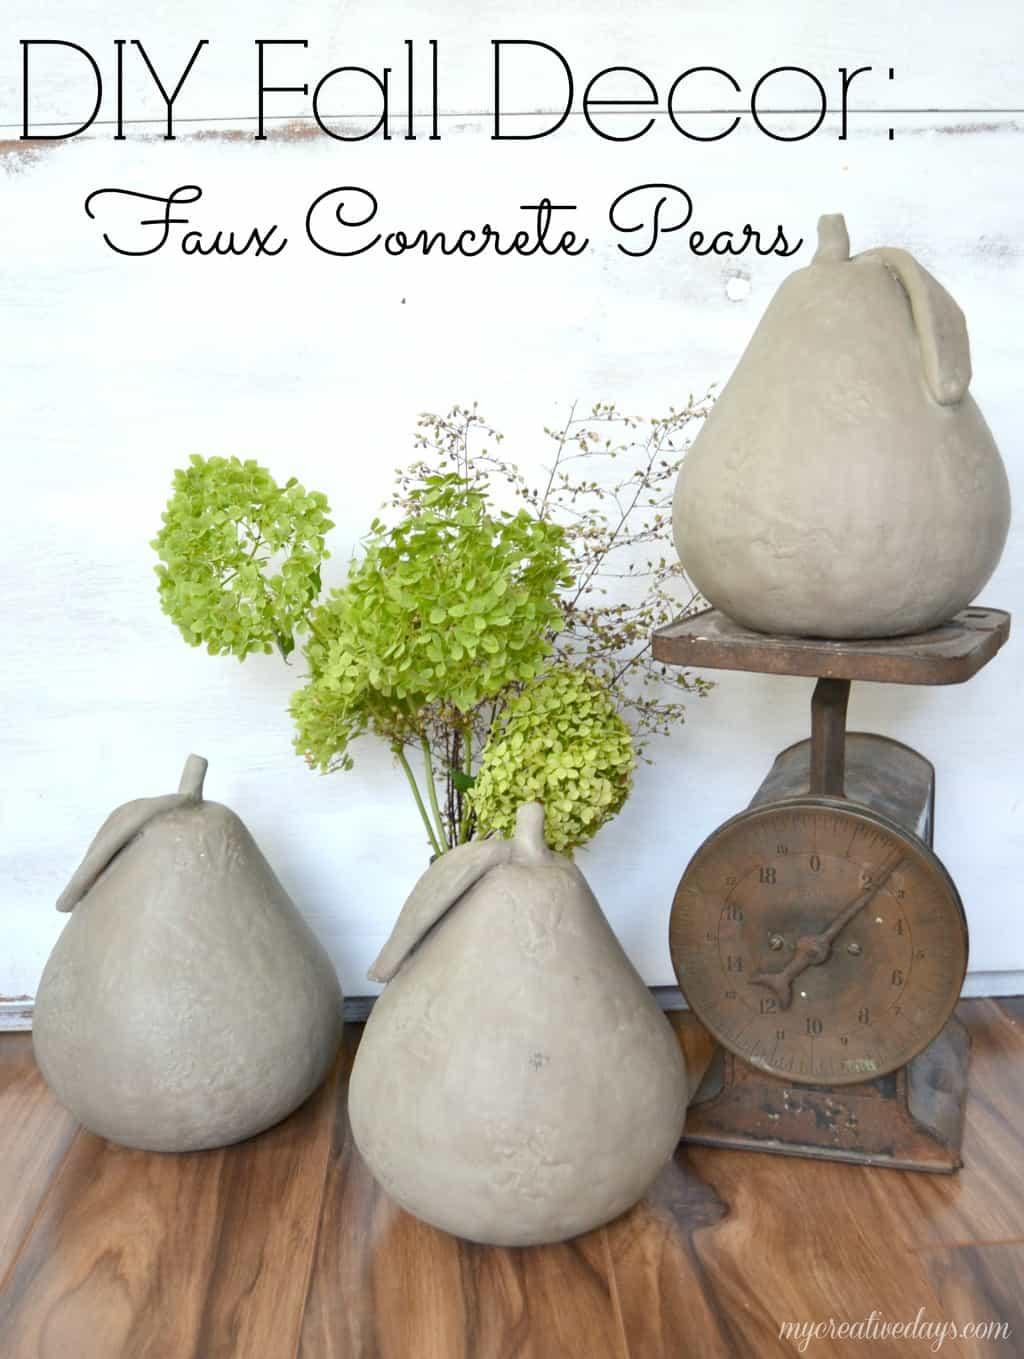 DIY Fall Decor: Faux Concrete Pears - My Creative Days